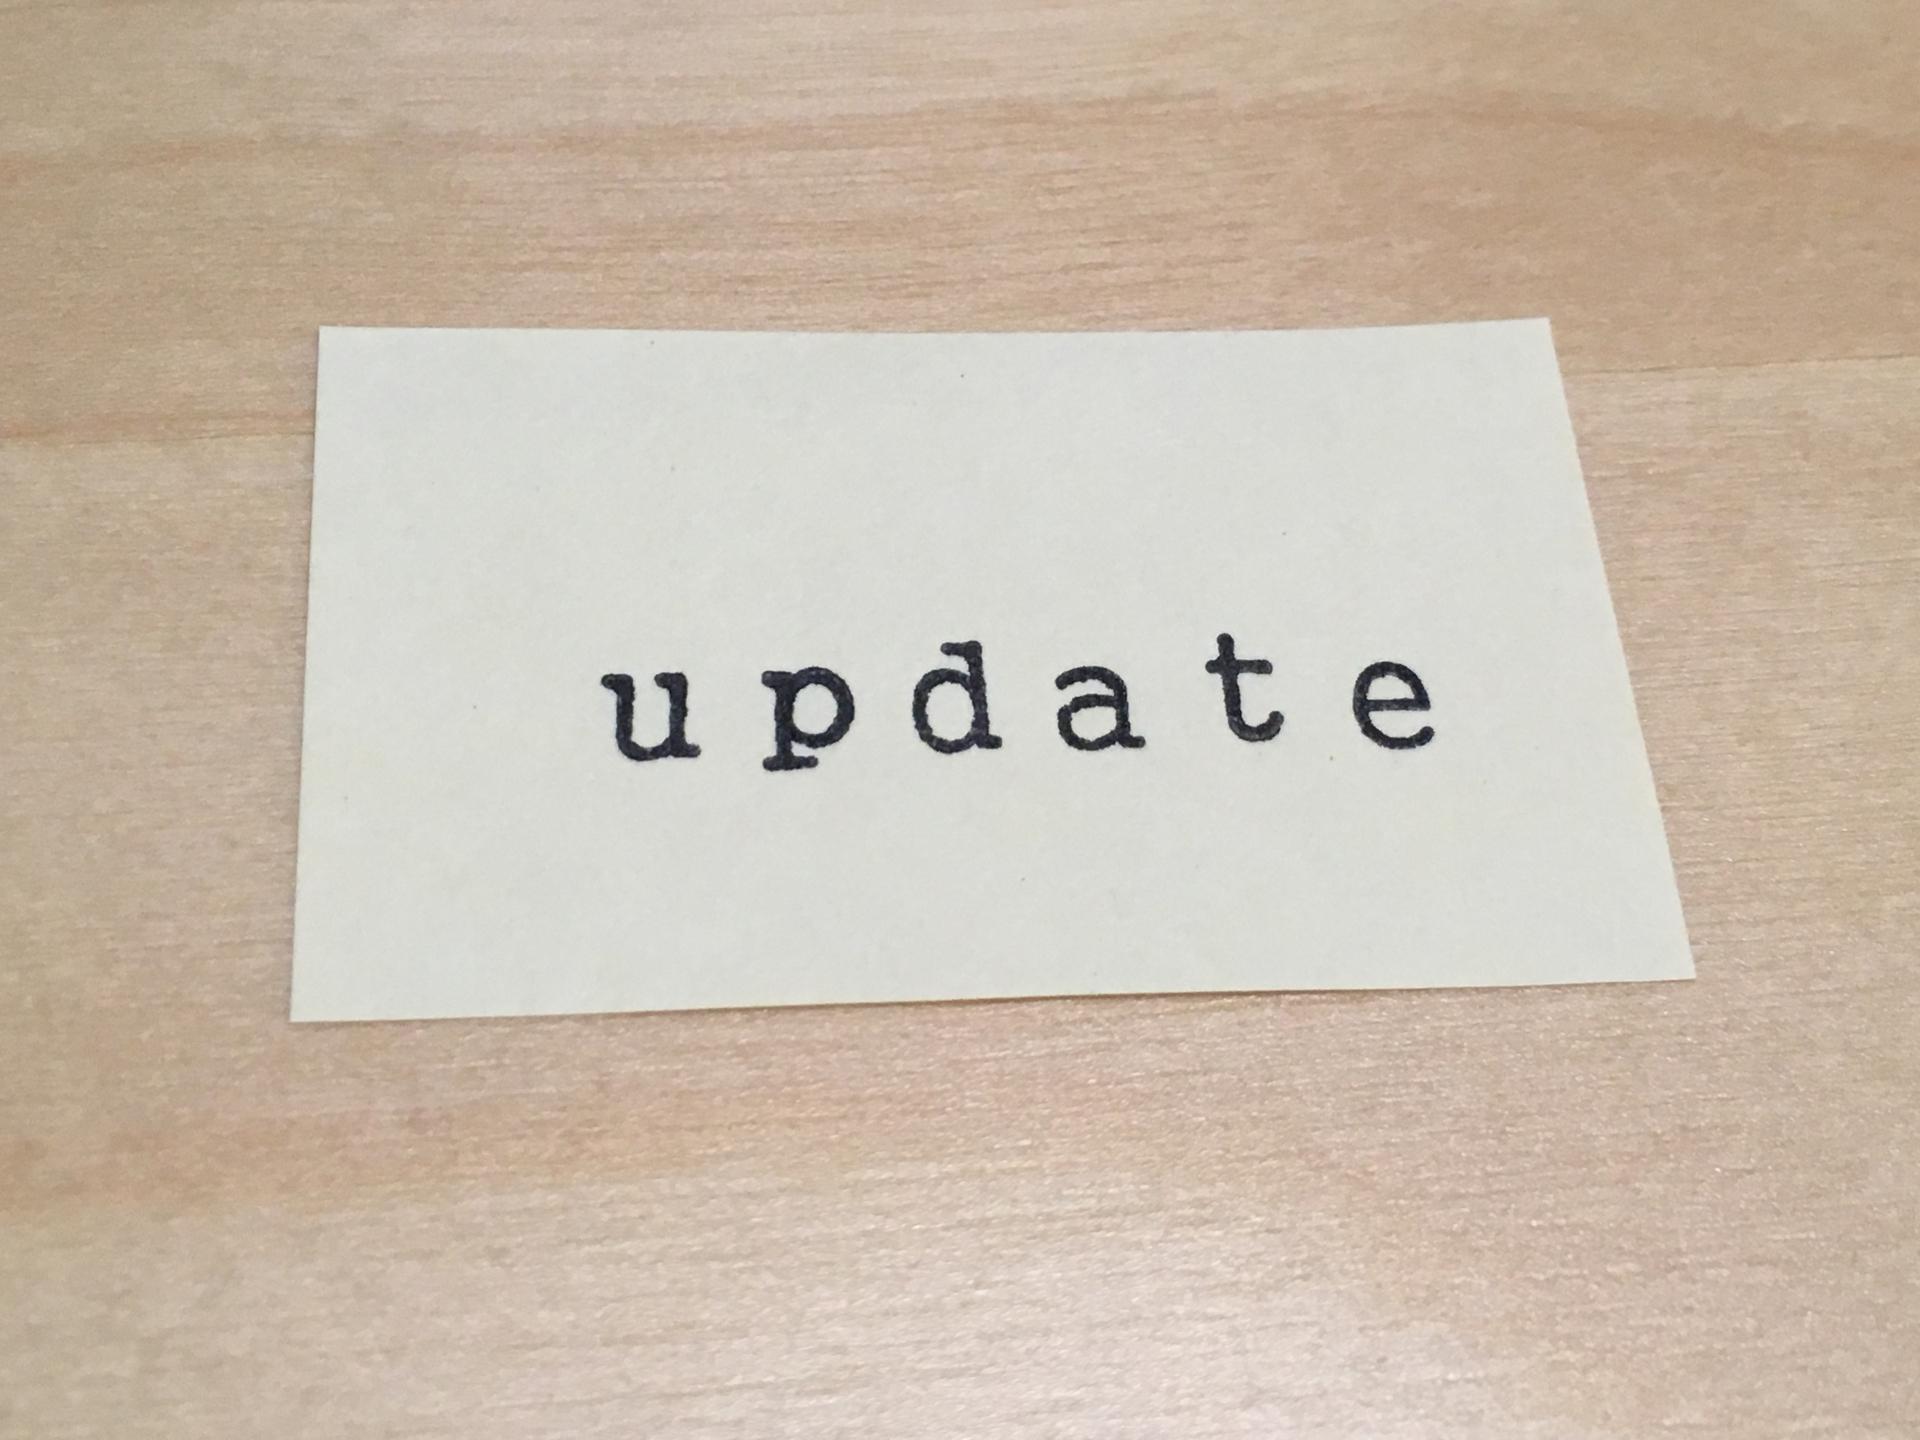 WordPressの更新(アップデート)方法と注意点 初心者向け基本操作編